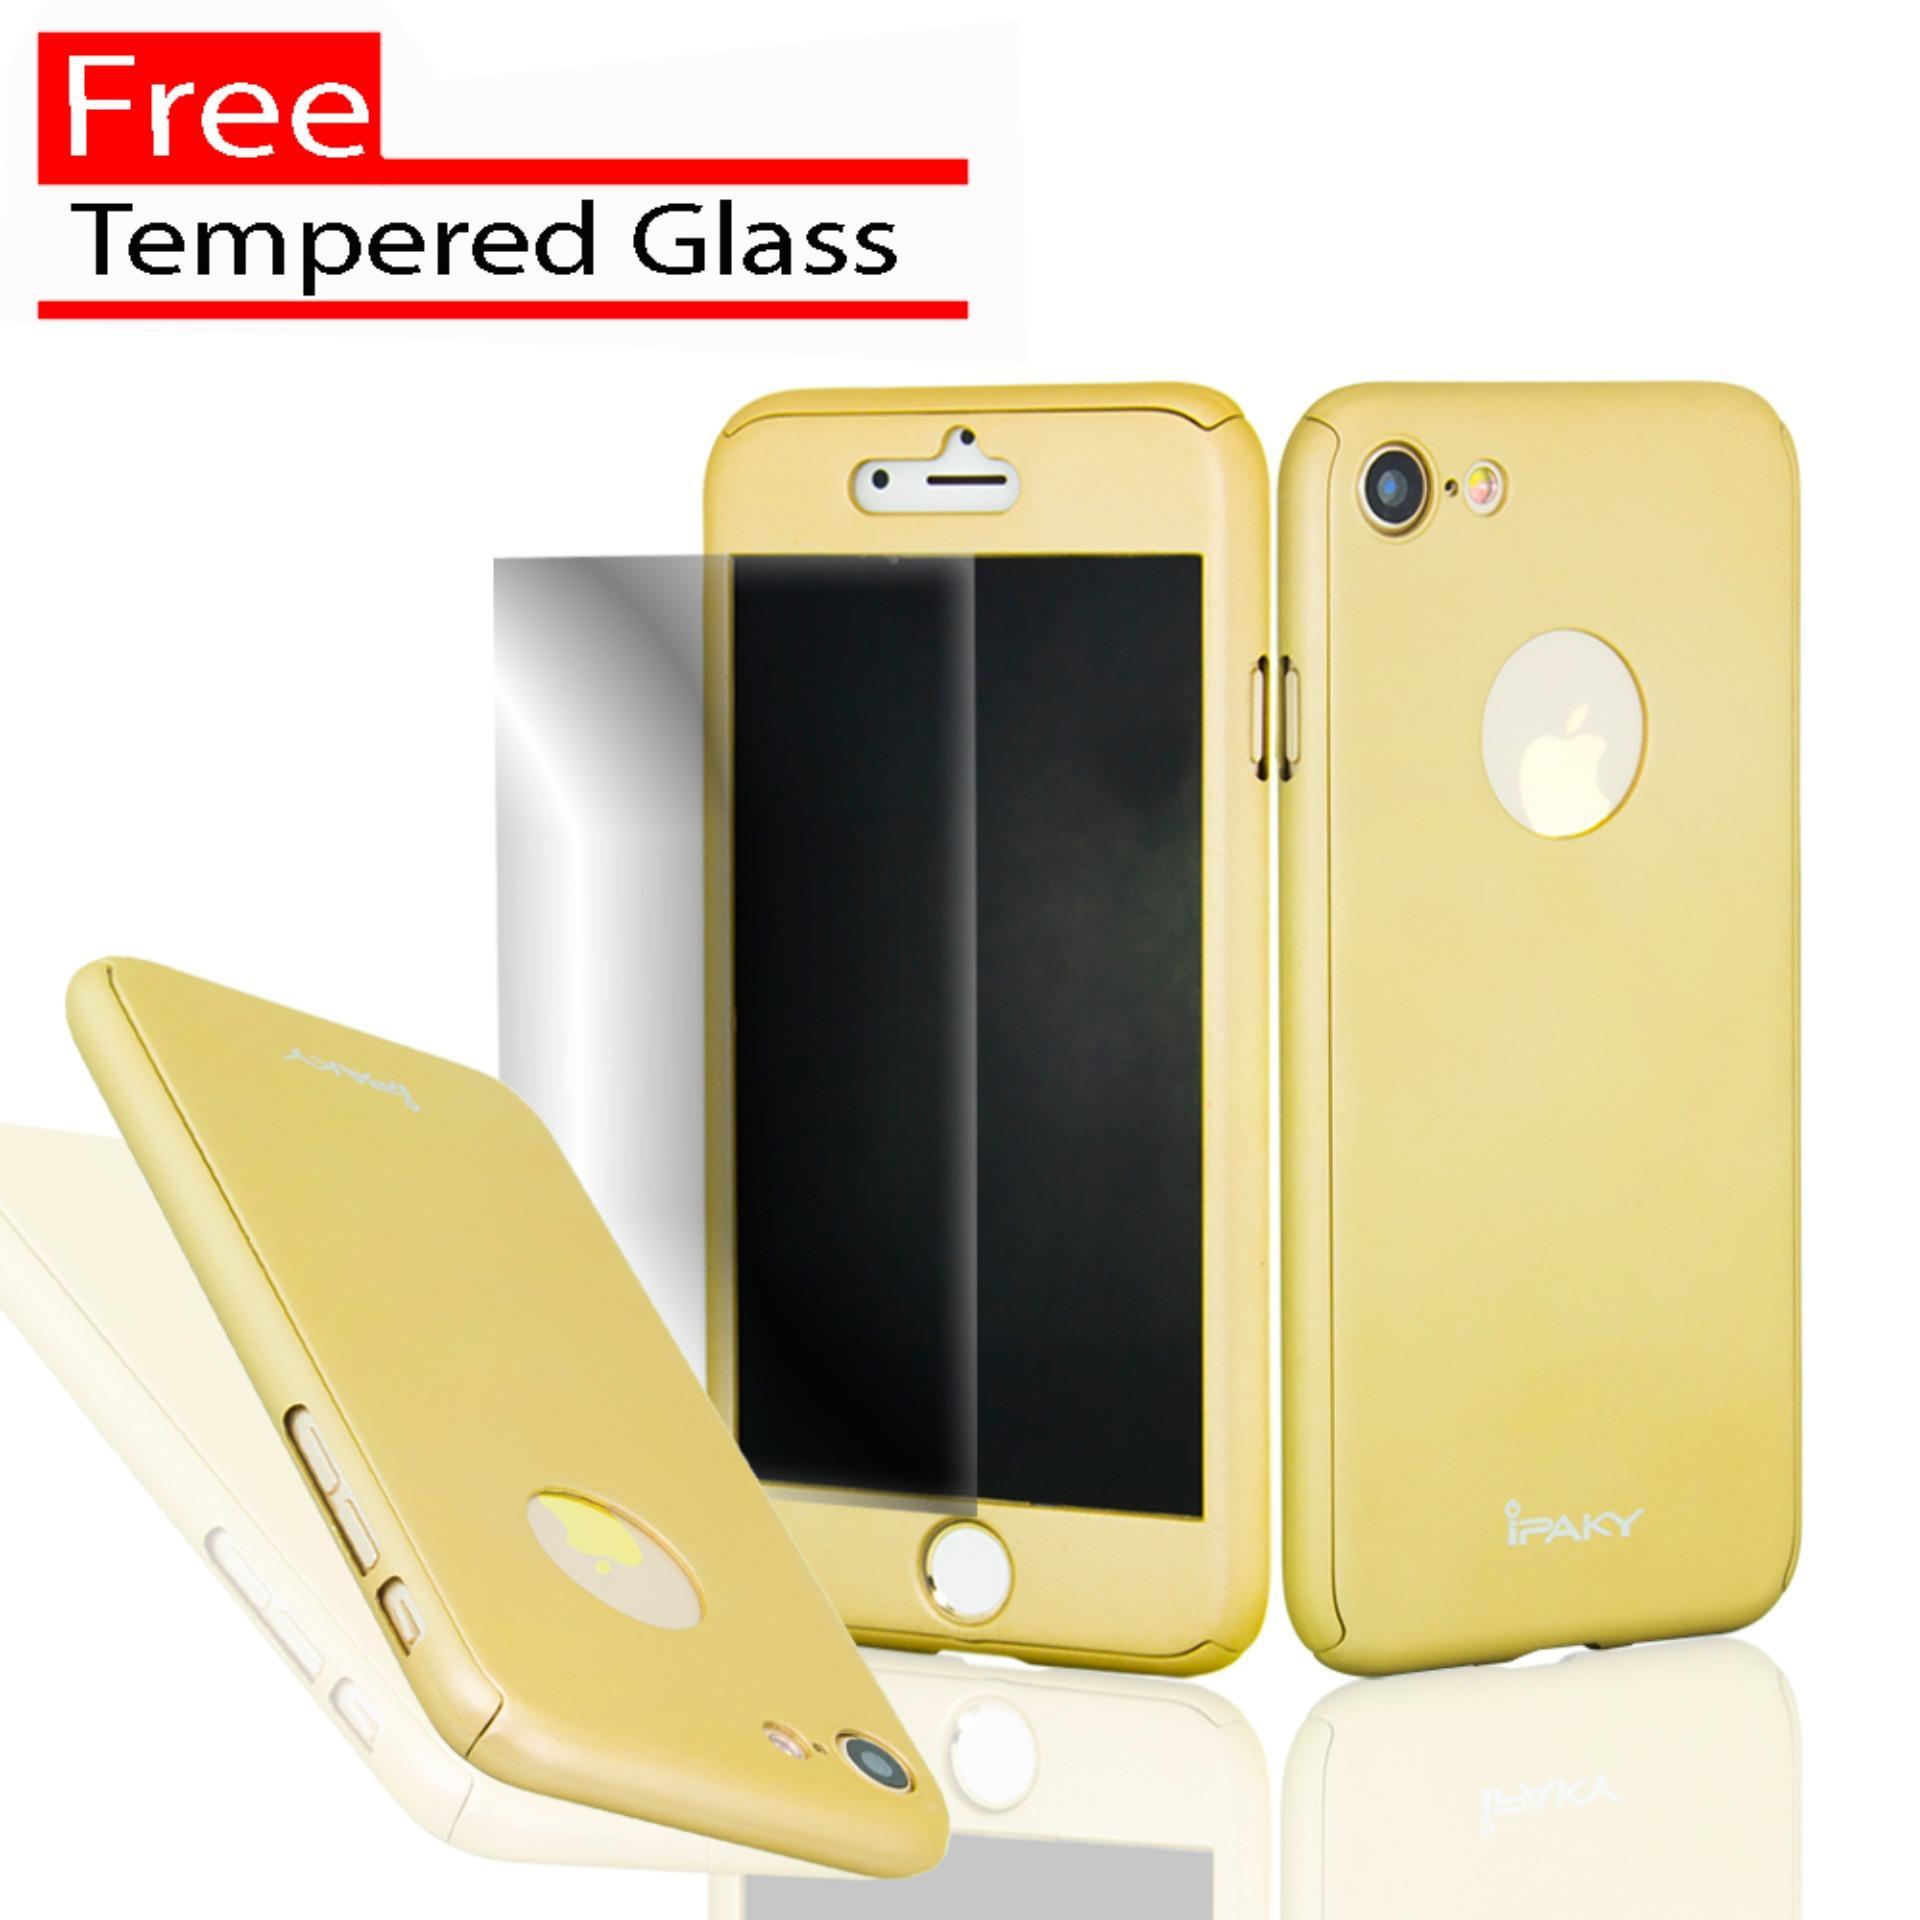 Cek Harga Baru Case Ipaky 360 Full Protection For Iphone 7 Plus Free